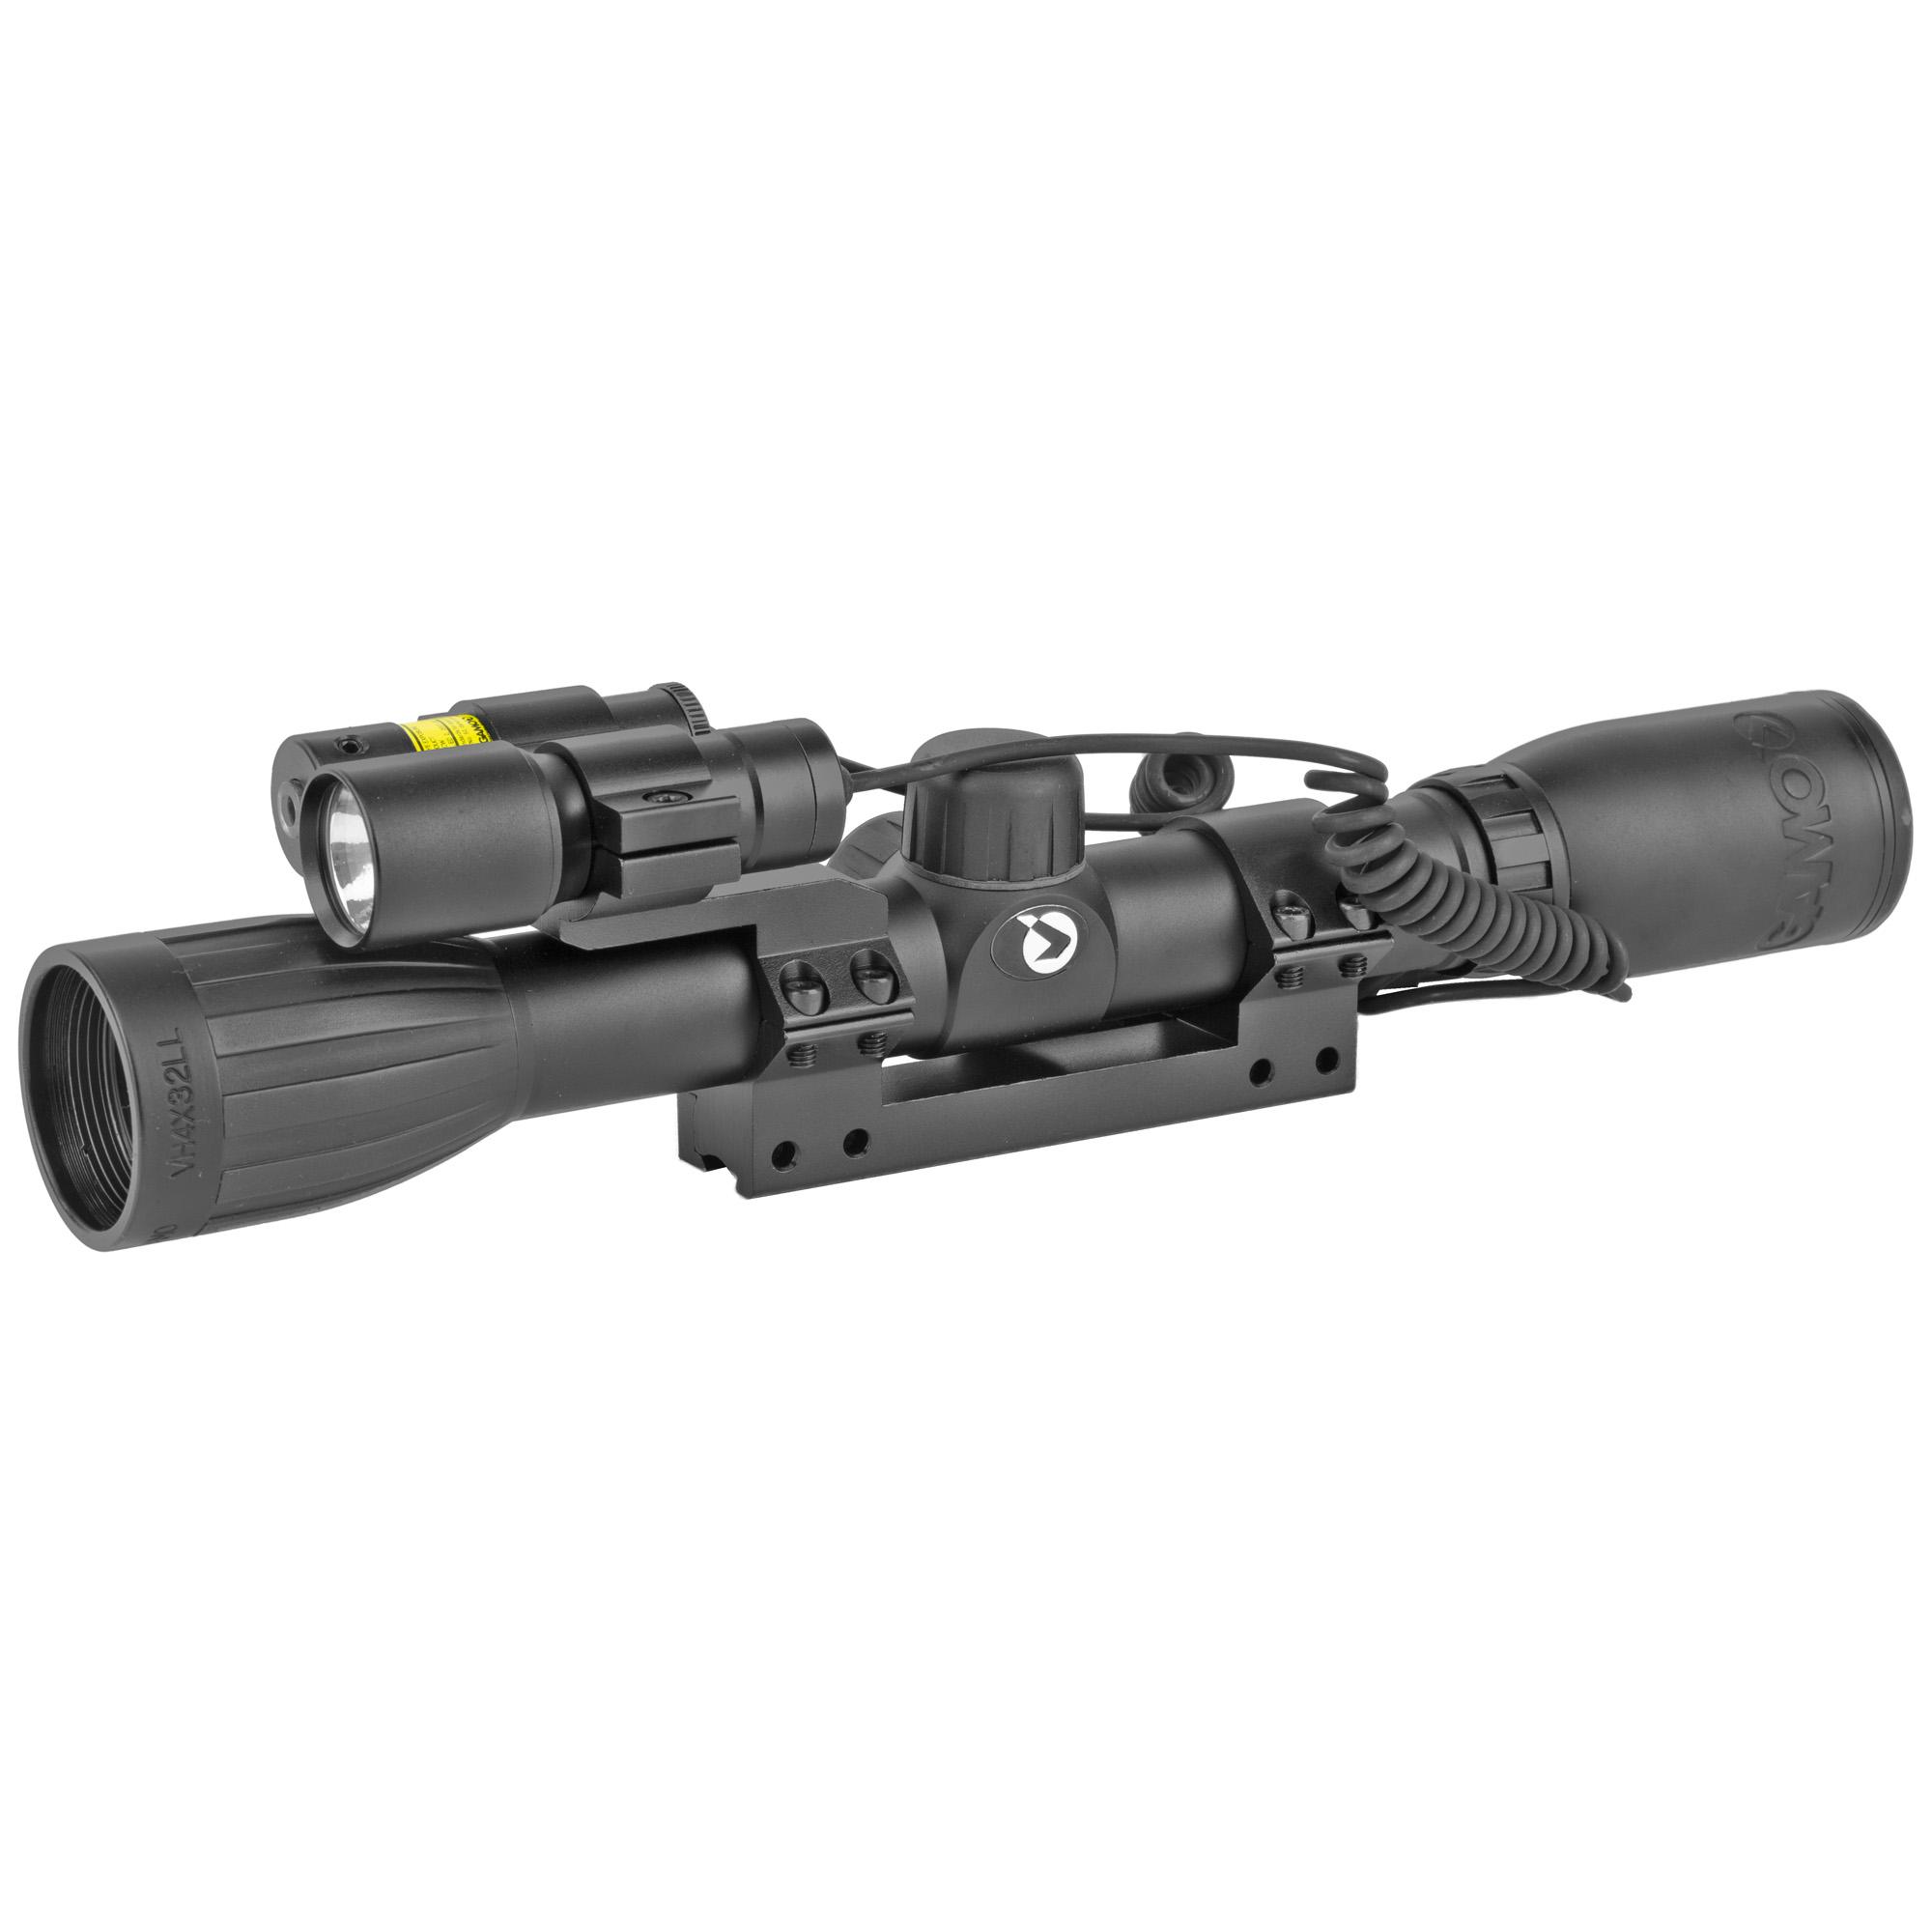 Gamo Varm Huntr 4x32 Scp/light/laser